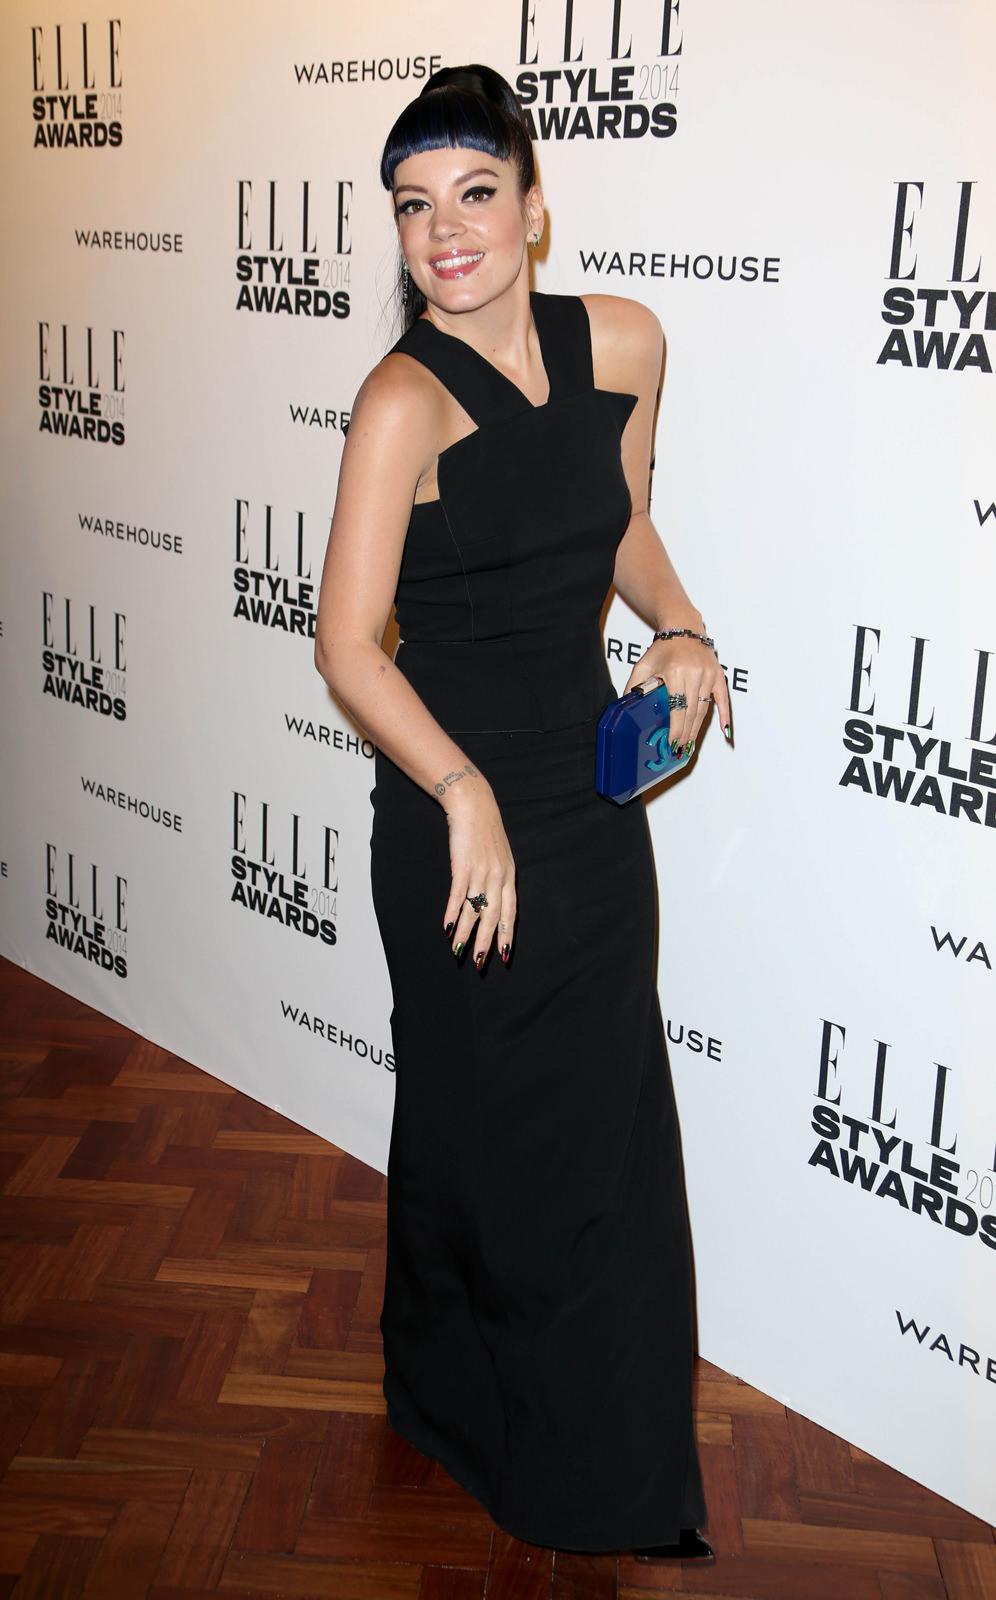 Lily Allen Photo Gallery